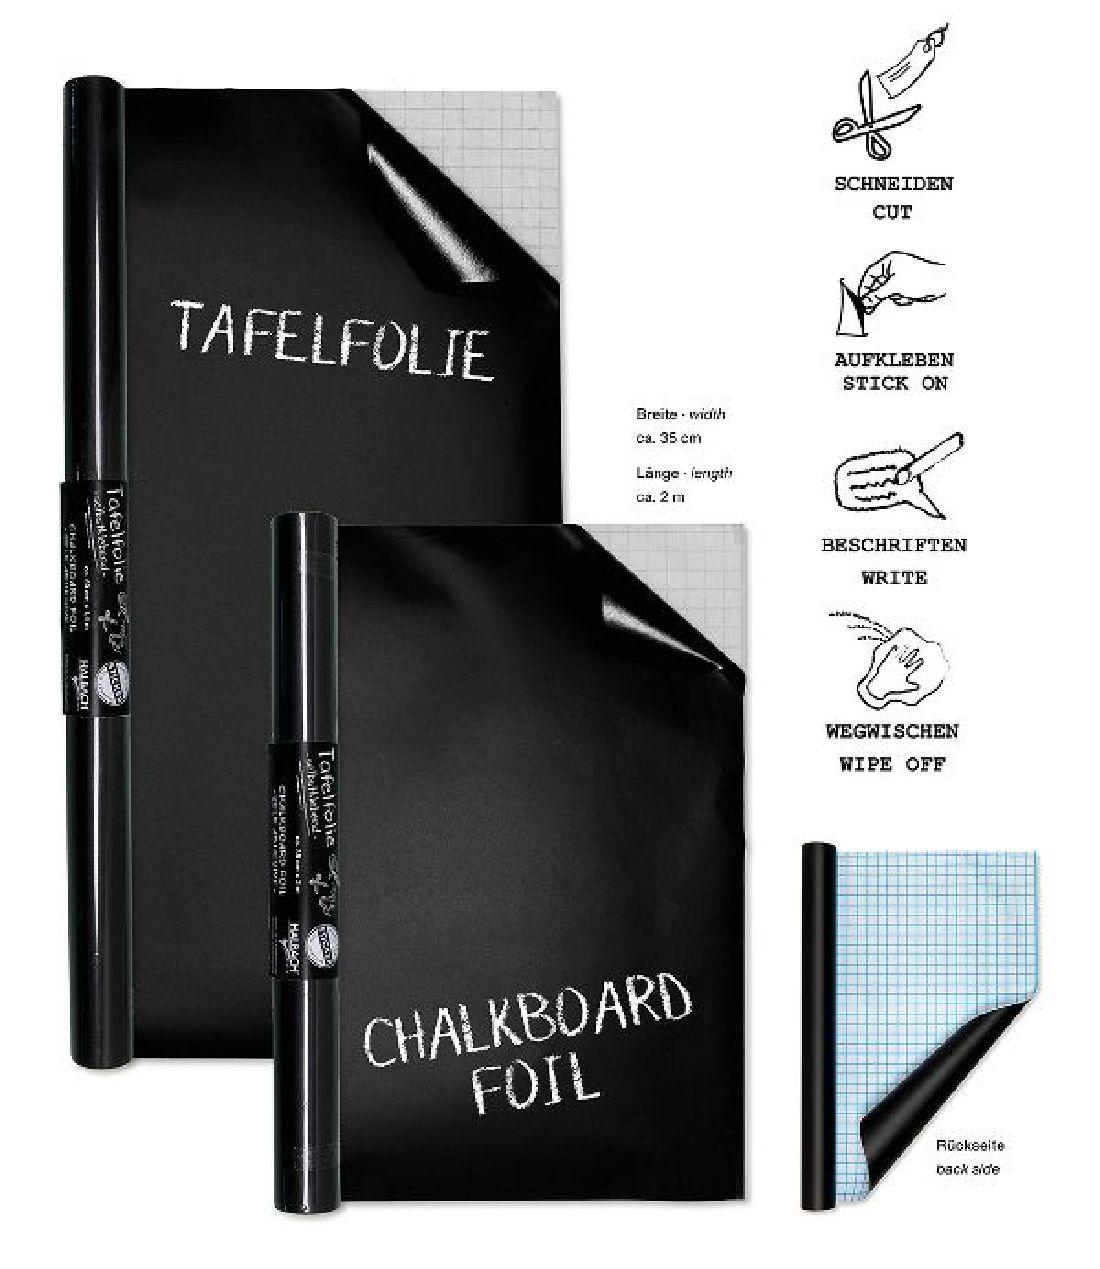 tafelfolie schwarz 19680 35cm x 2m selbstklebend. Black Bedroom Furniture Sets. Home Design Ideas